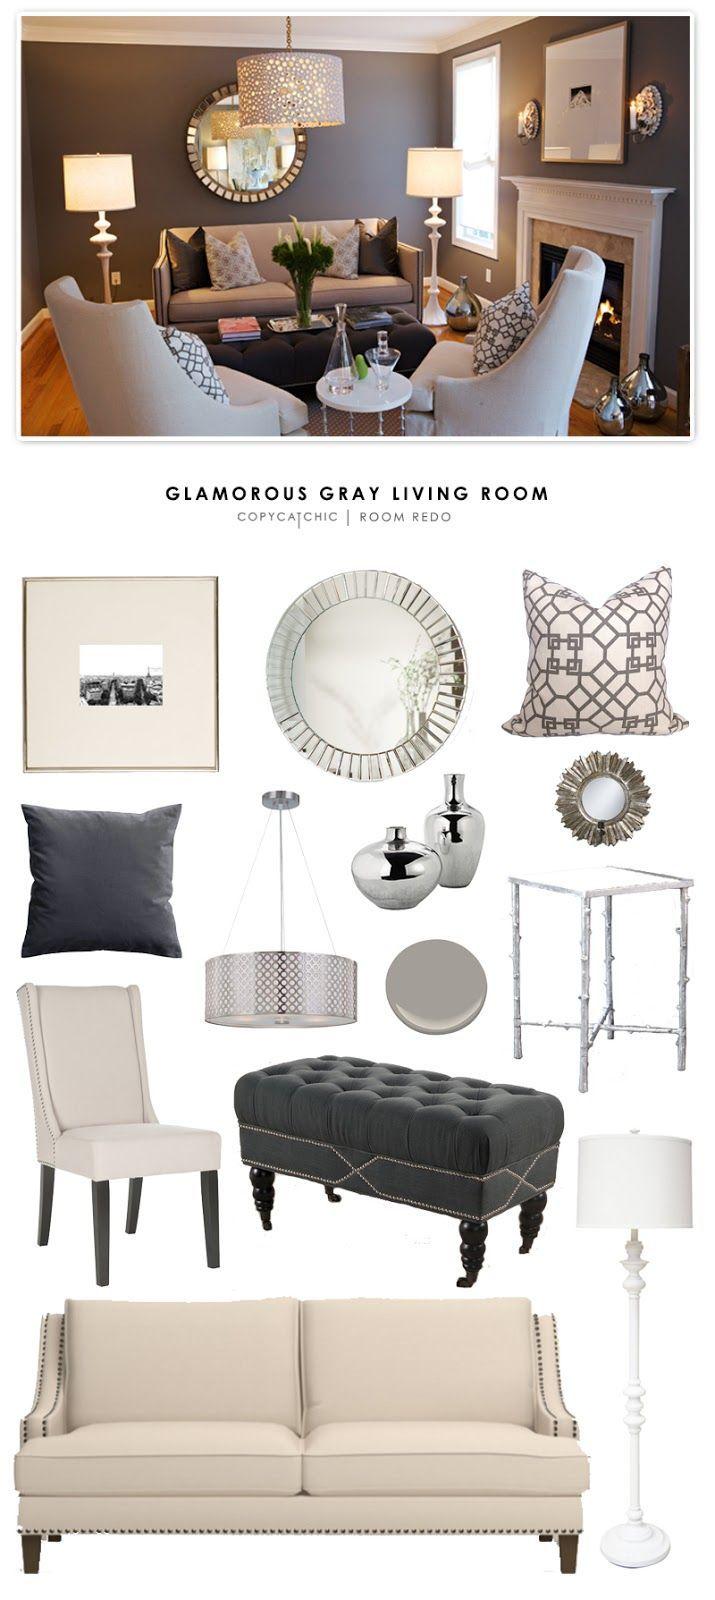 Copy Cat Chic Room Redo | Glamorous Gray Living Room Update